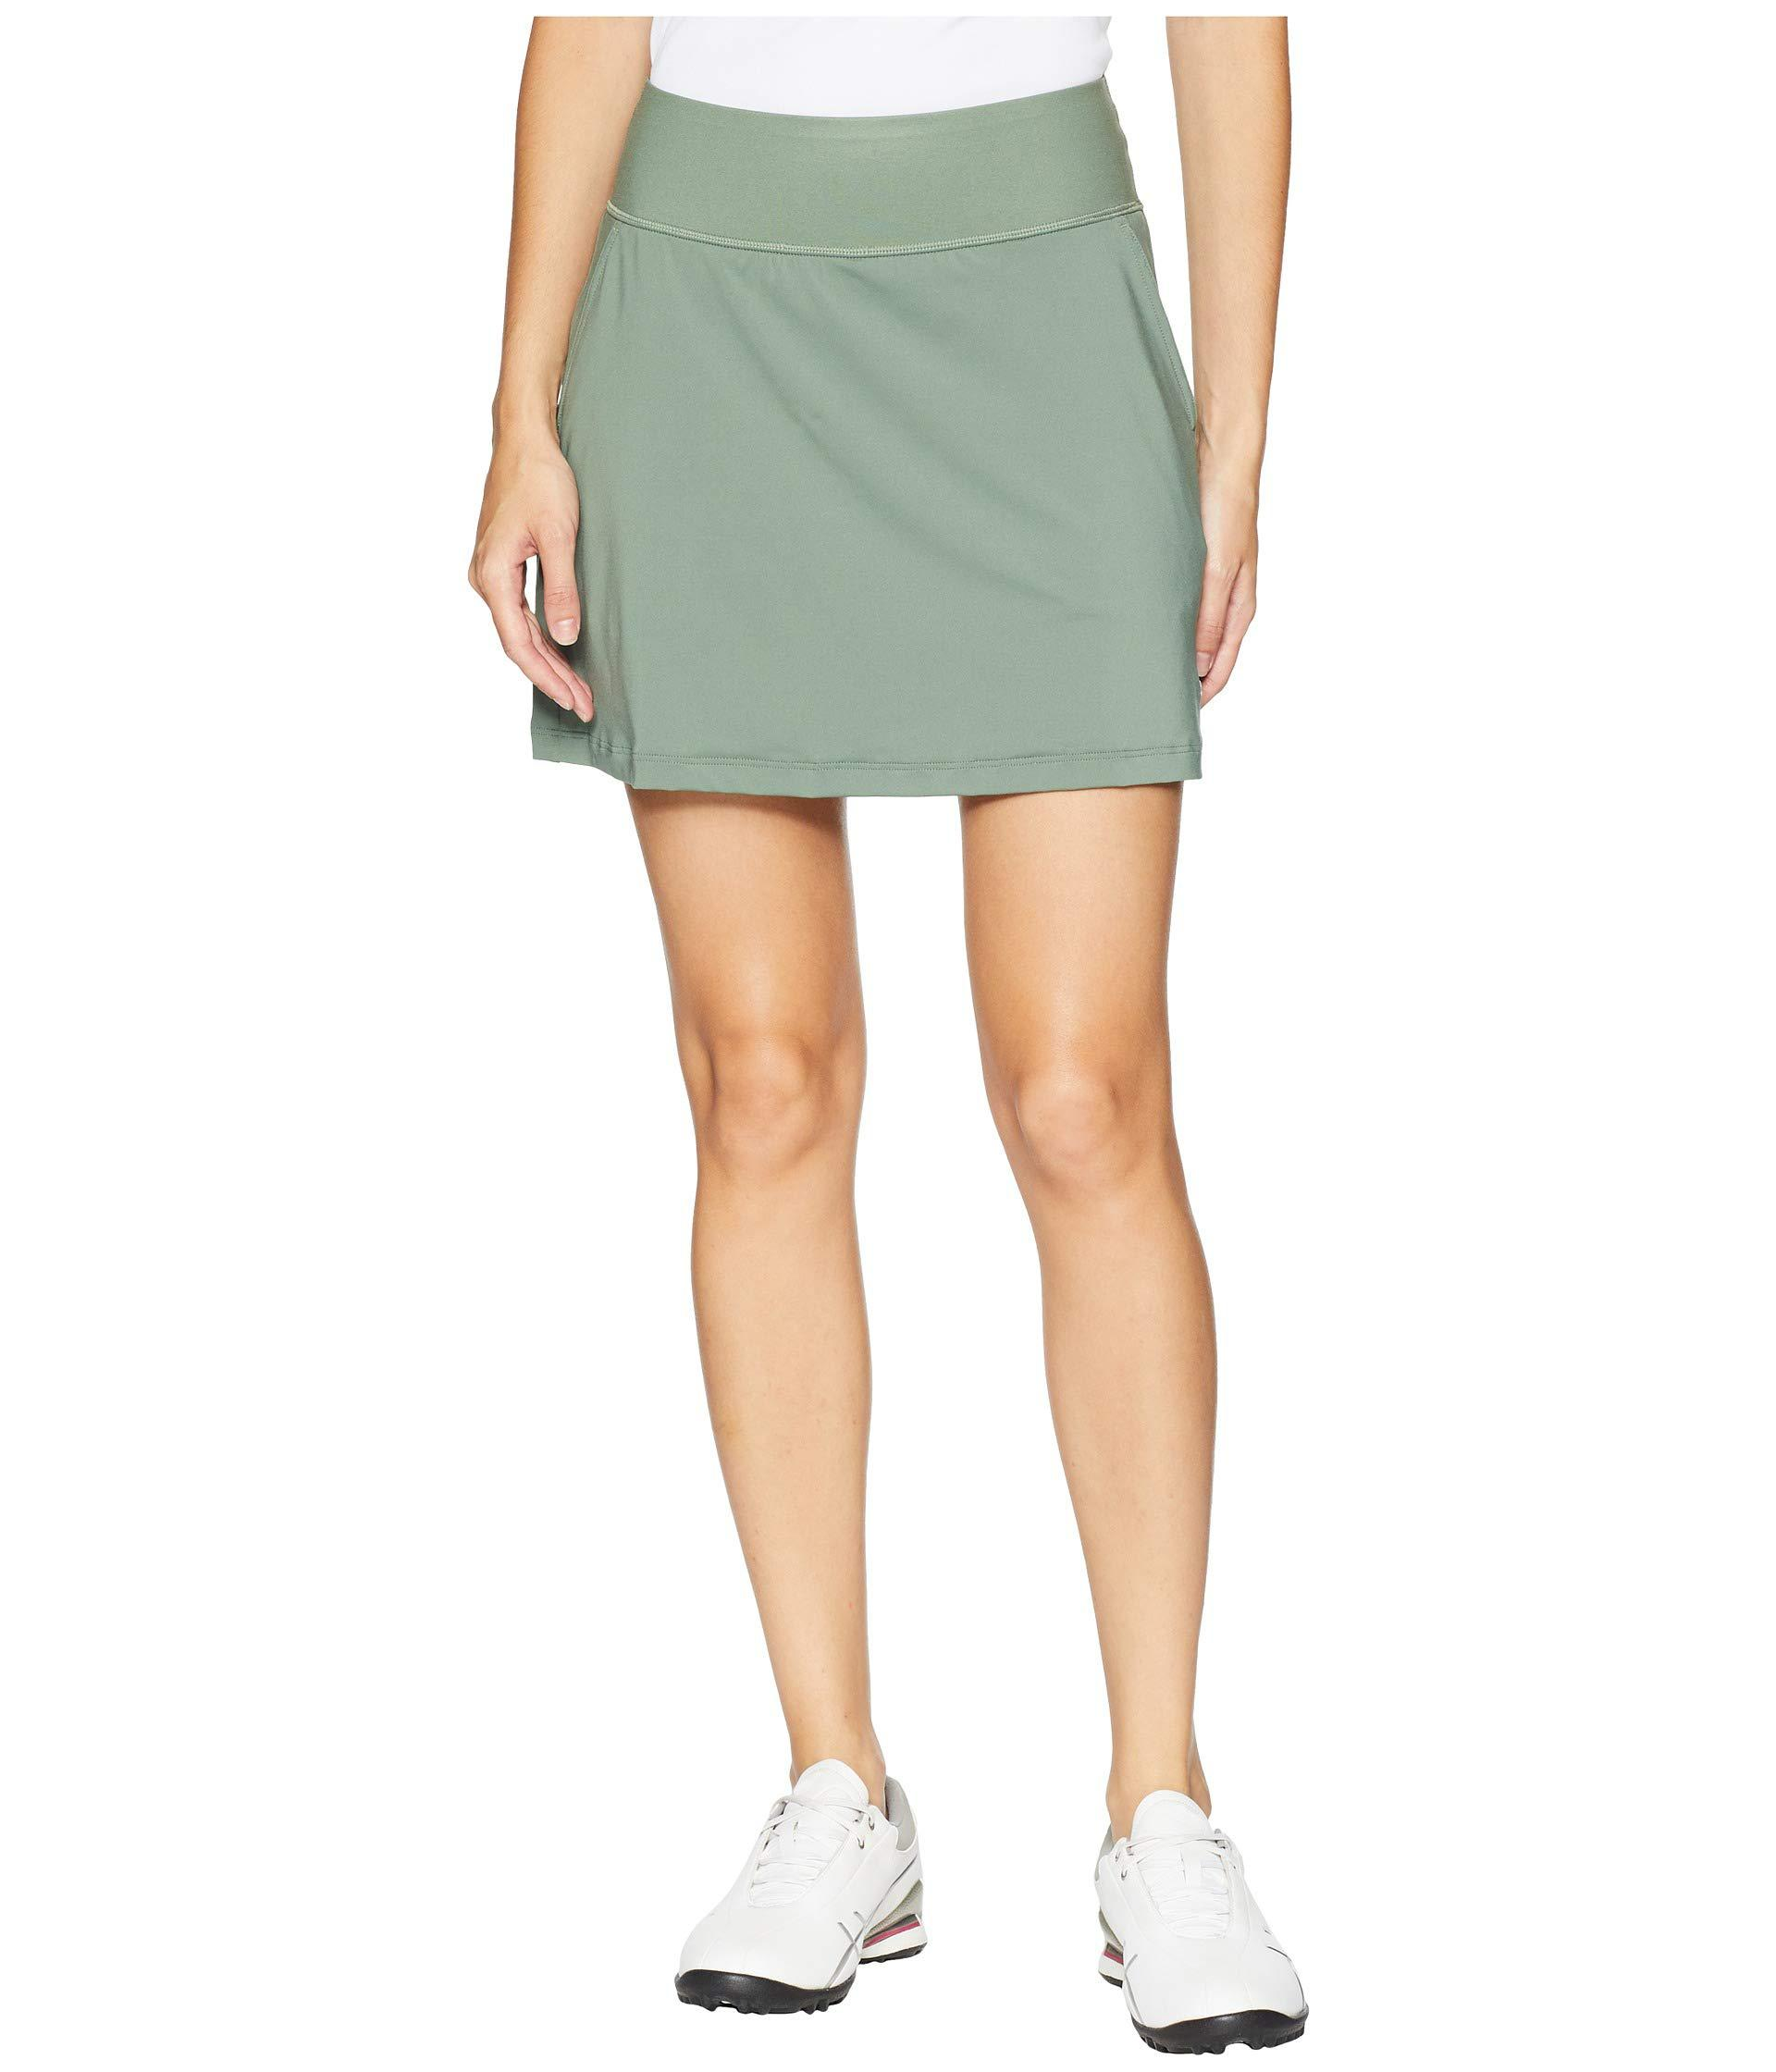 7efb82034 Lyst - PUMA Pwrshape Solid Knit Skirt in Green - Save 13%